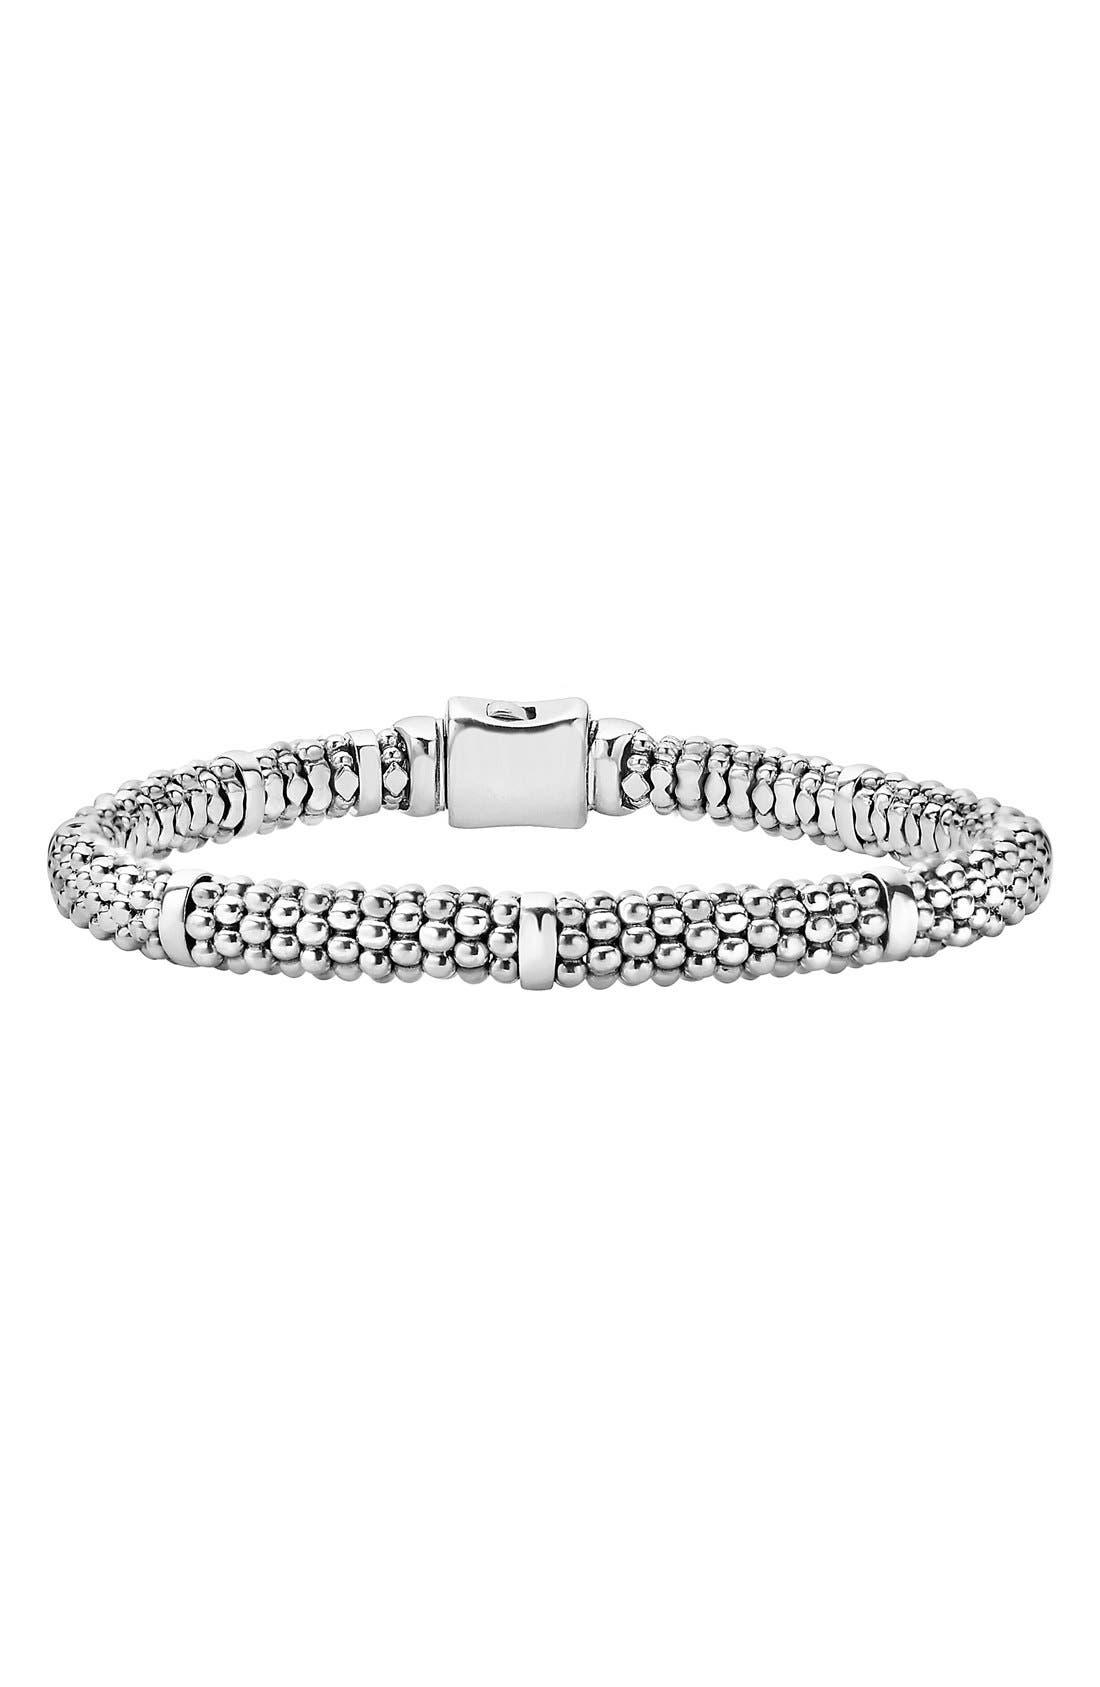 Caviar Rope Station Bracelet,                         Main,                         color, Sterling Silver